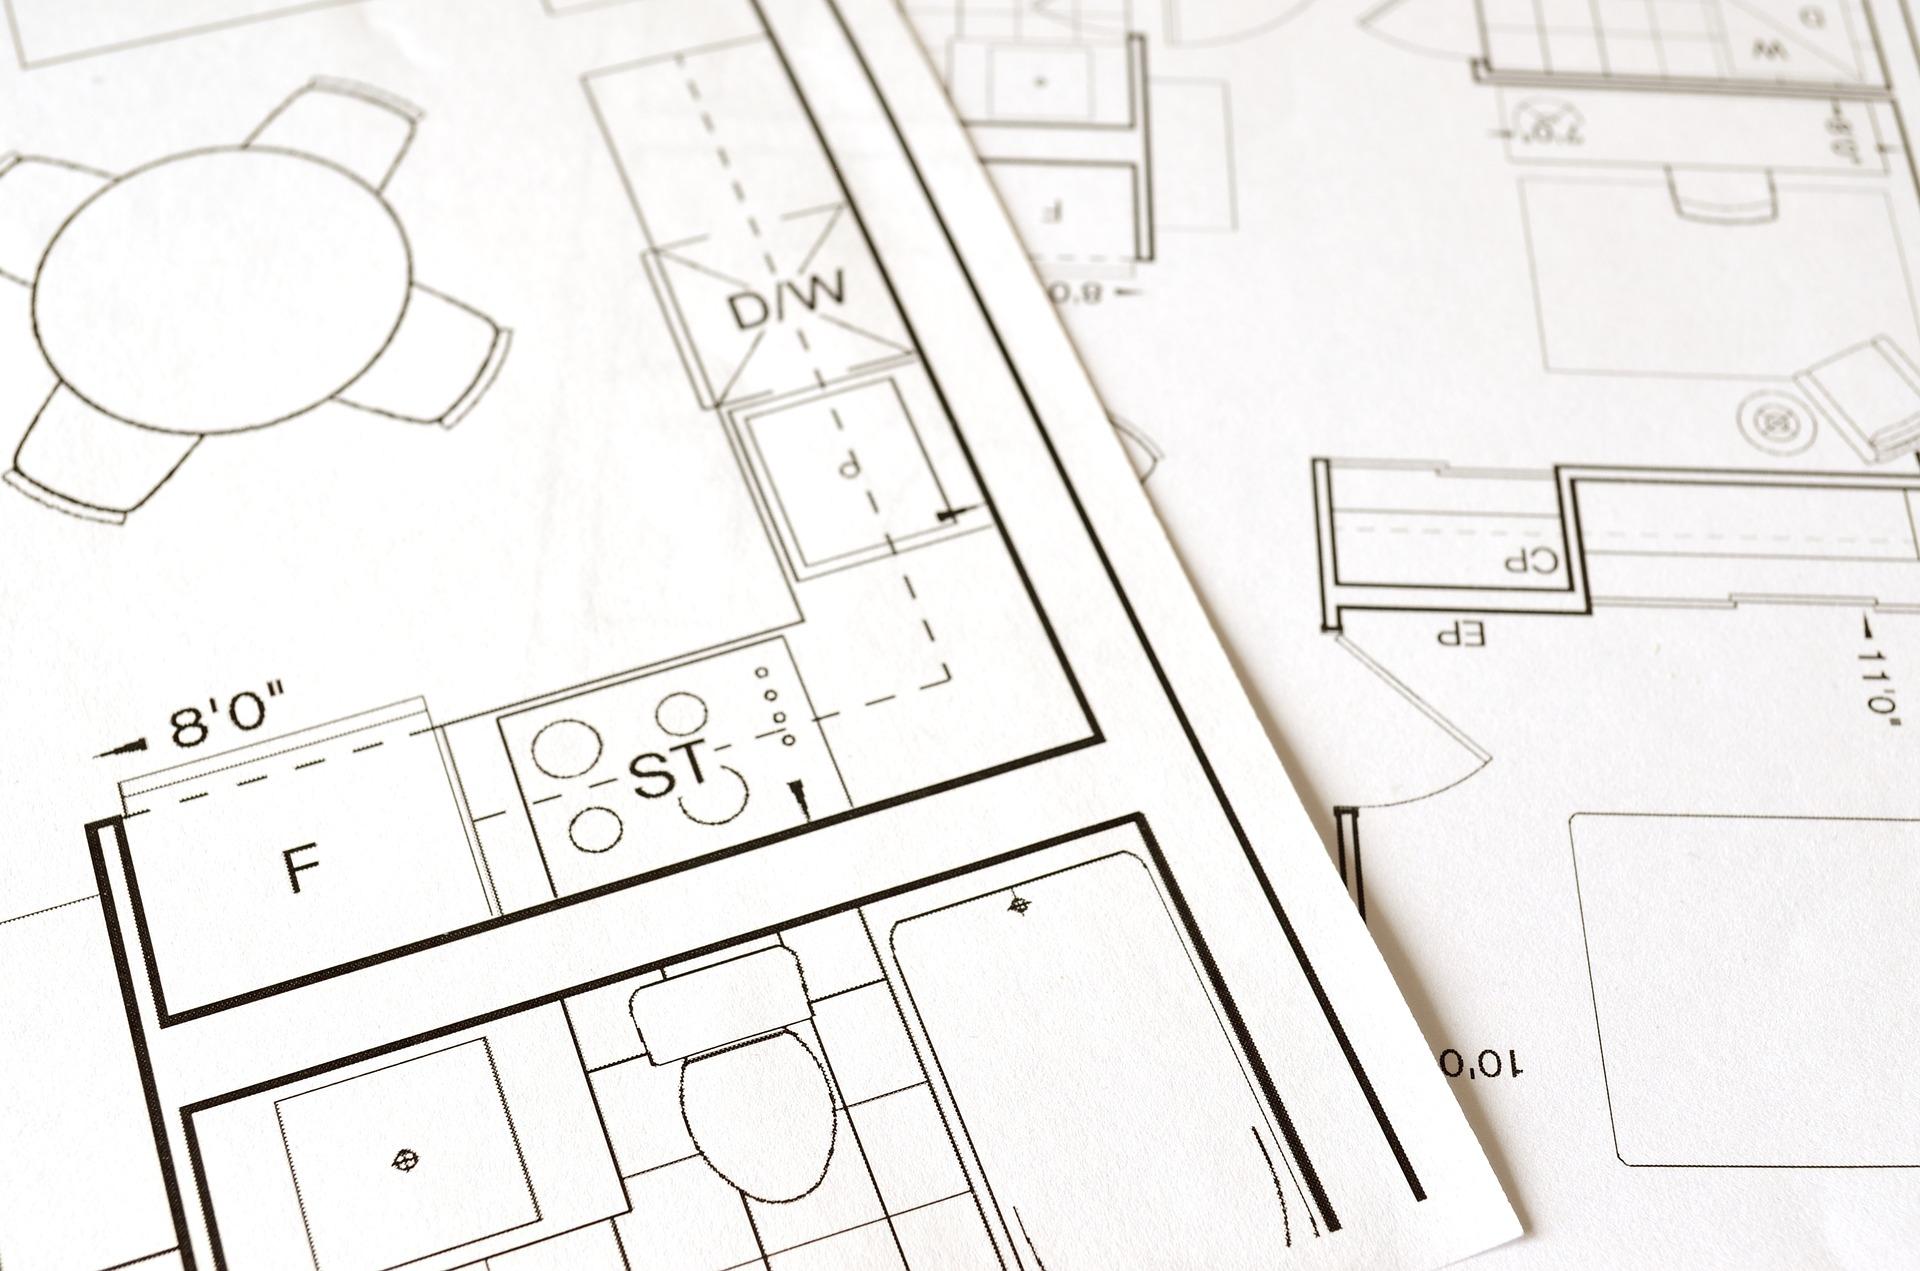 image of a house blueprint